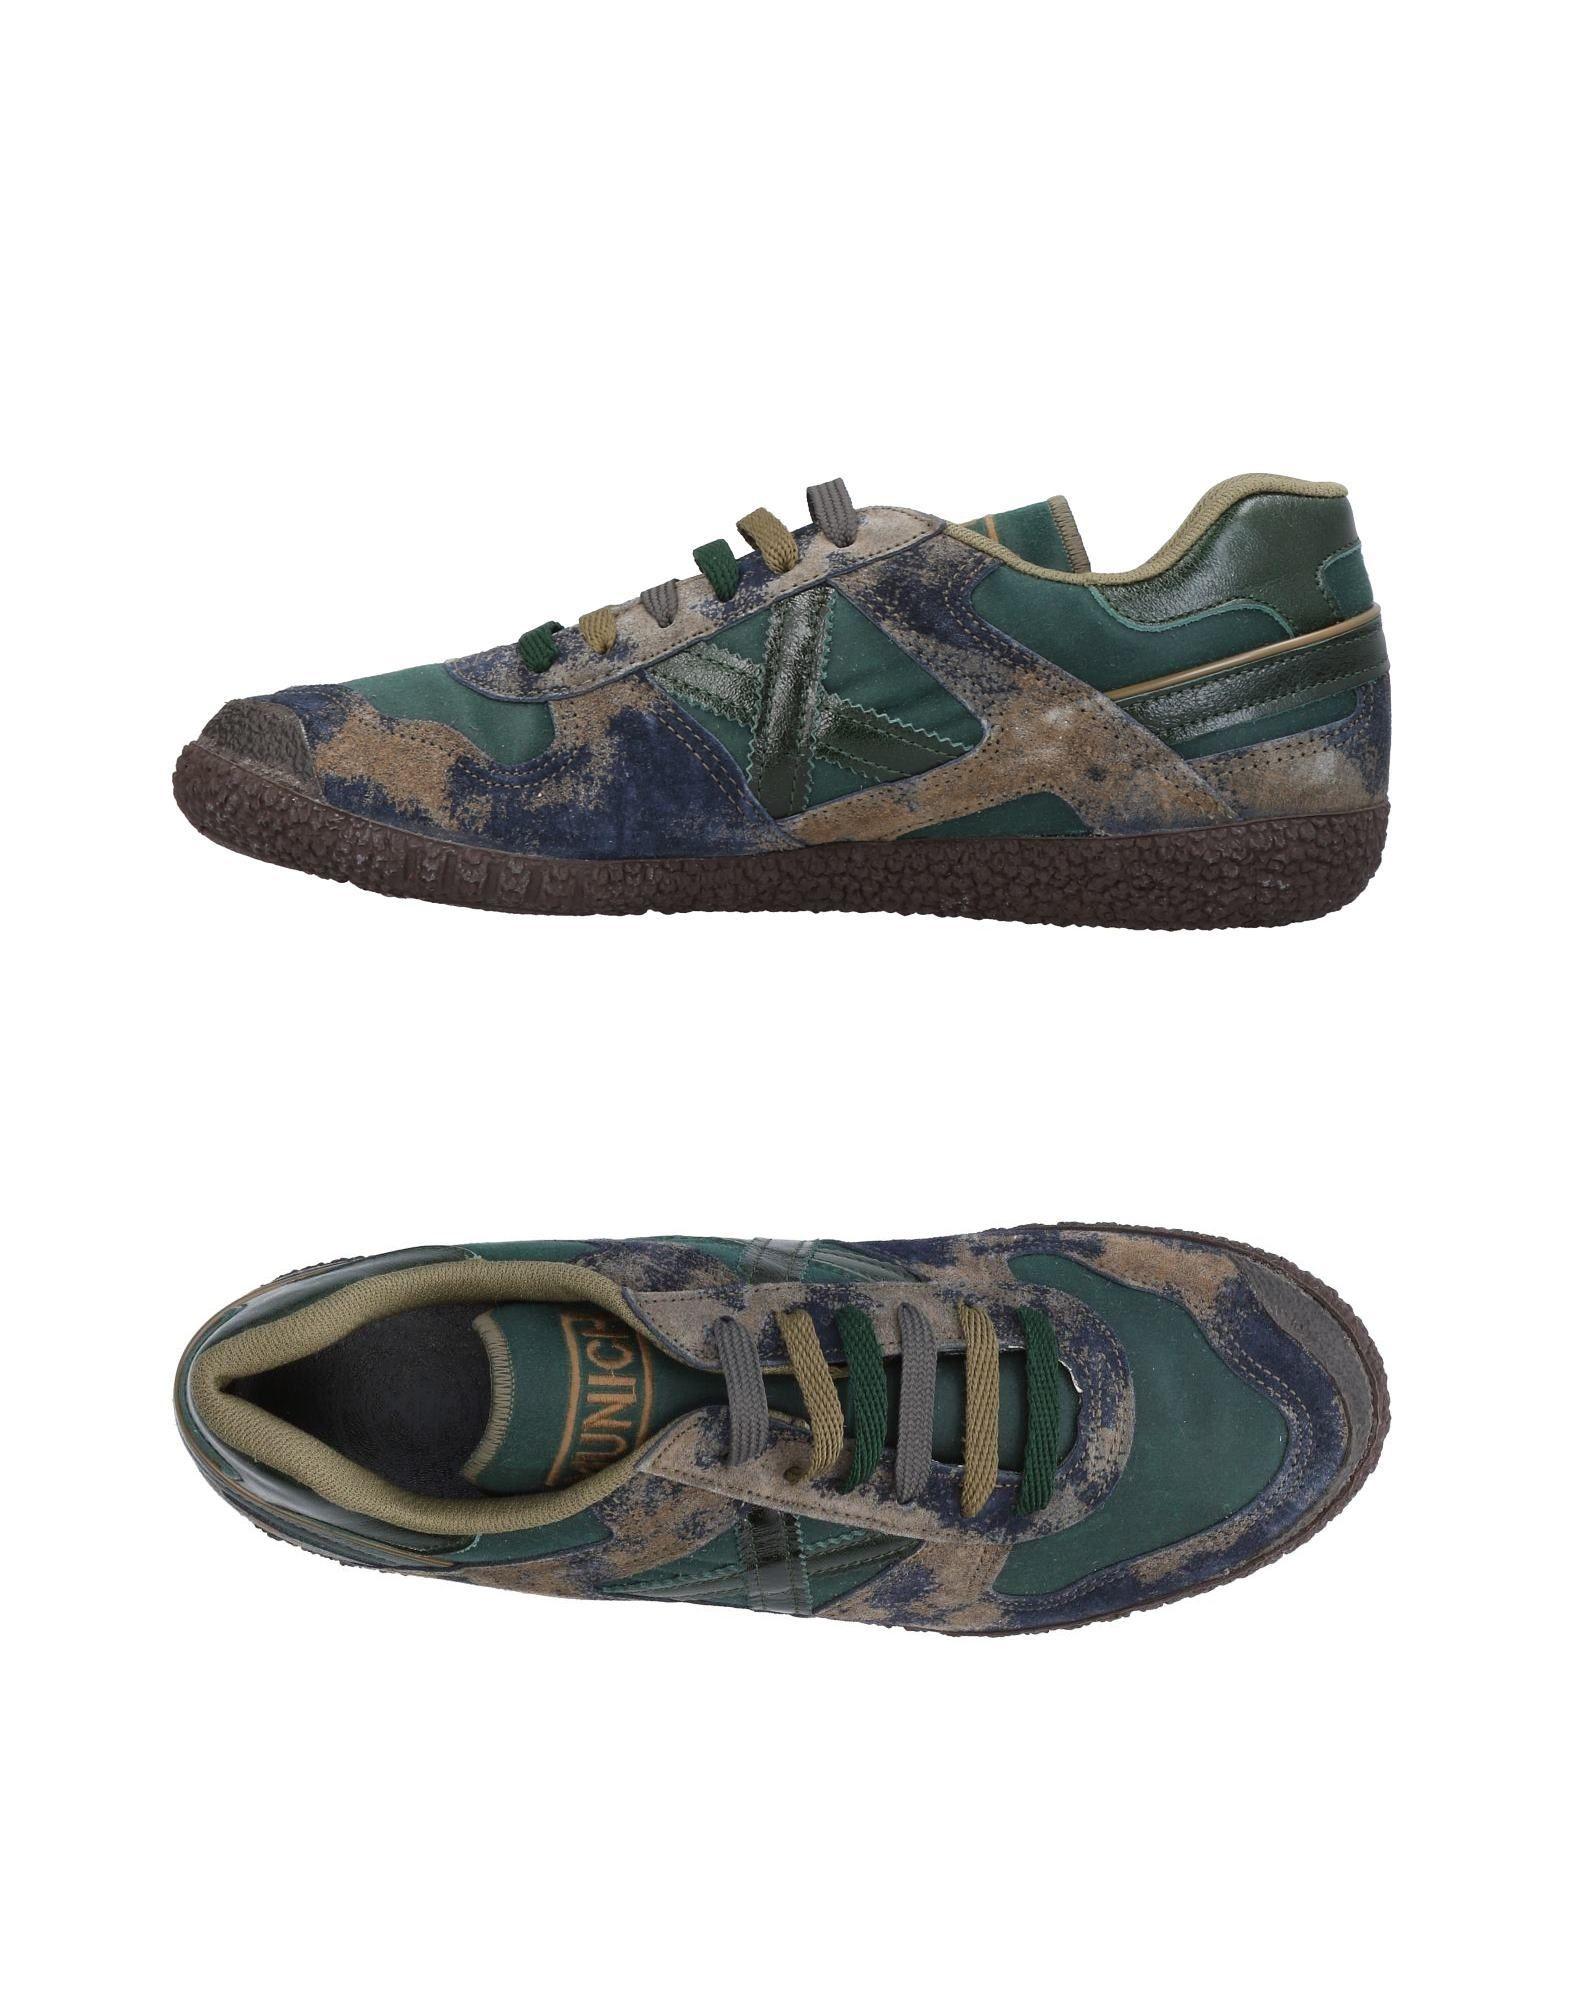 Moda Sneakers Munich Uomo - 11454727LT